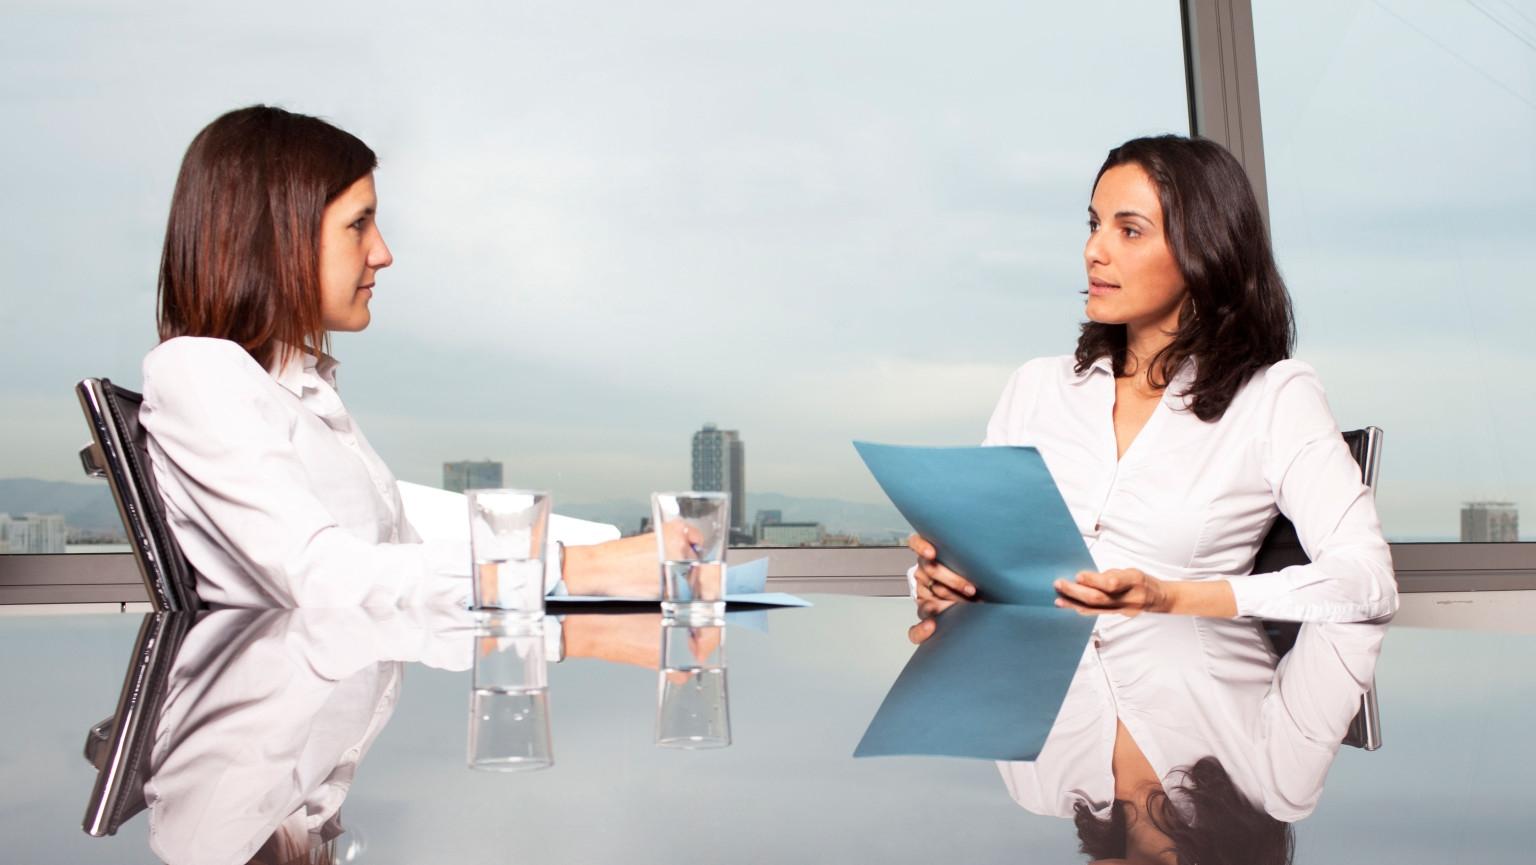 interviewing tips women jpg [ 1500 x 845 Pixel ]